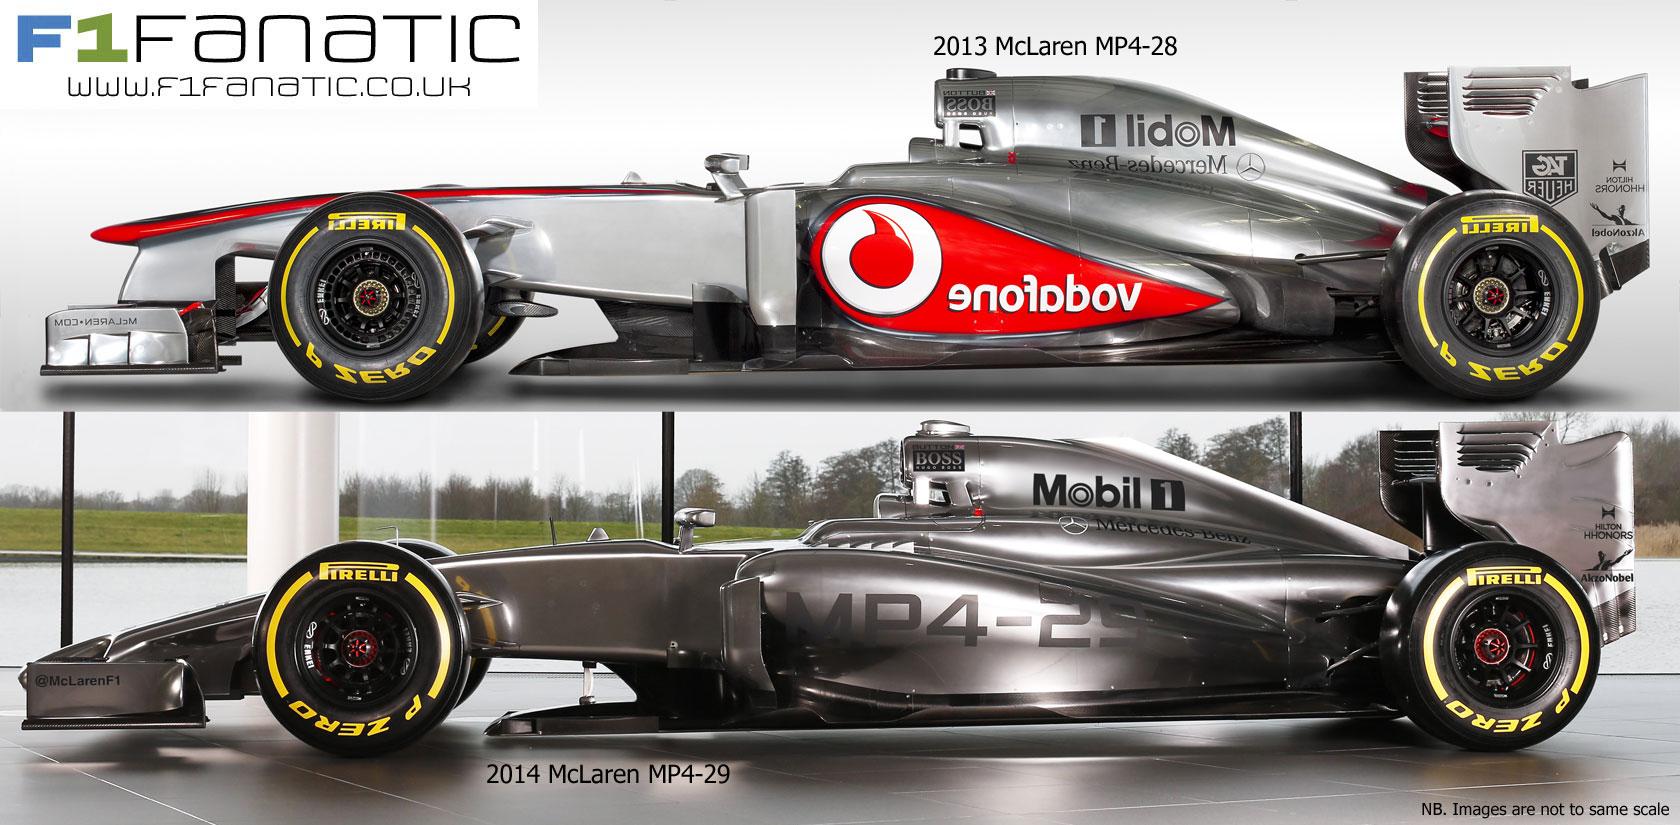 mclaren mp4-28 (2013) and mp4-29 (2014), profile · racefans